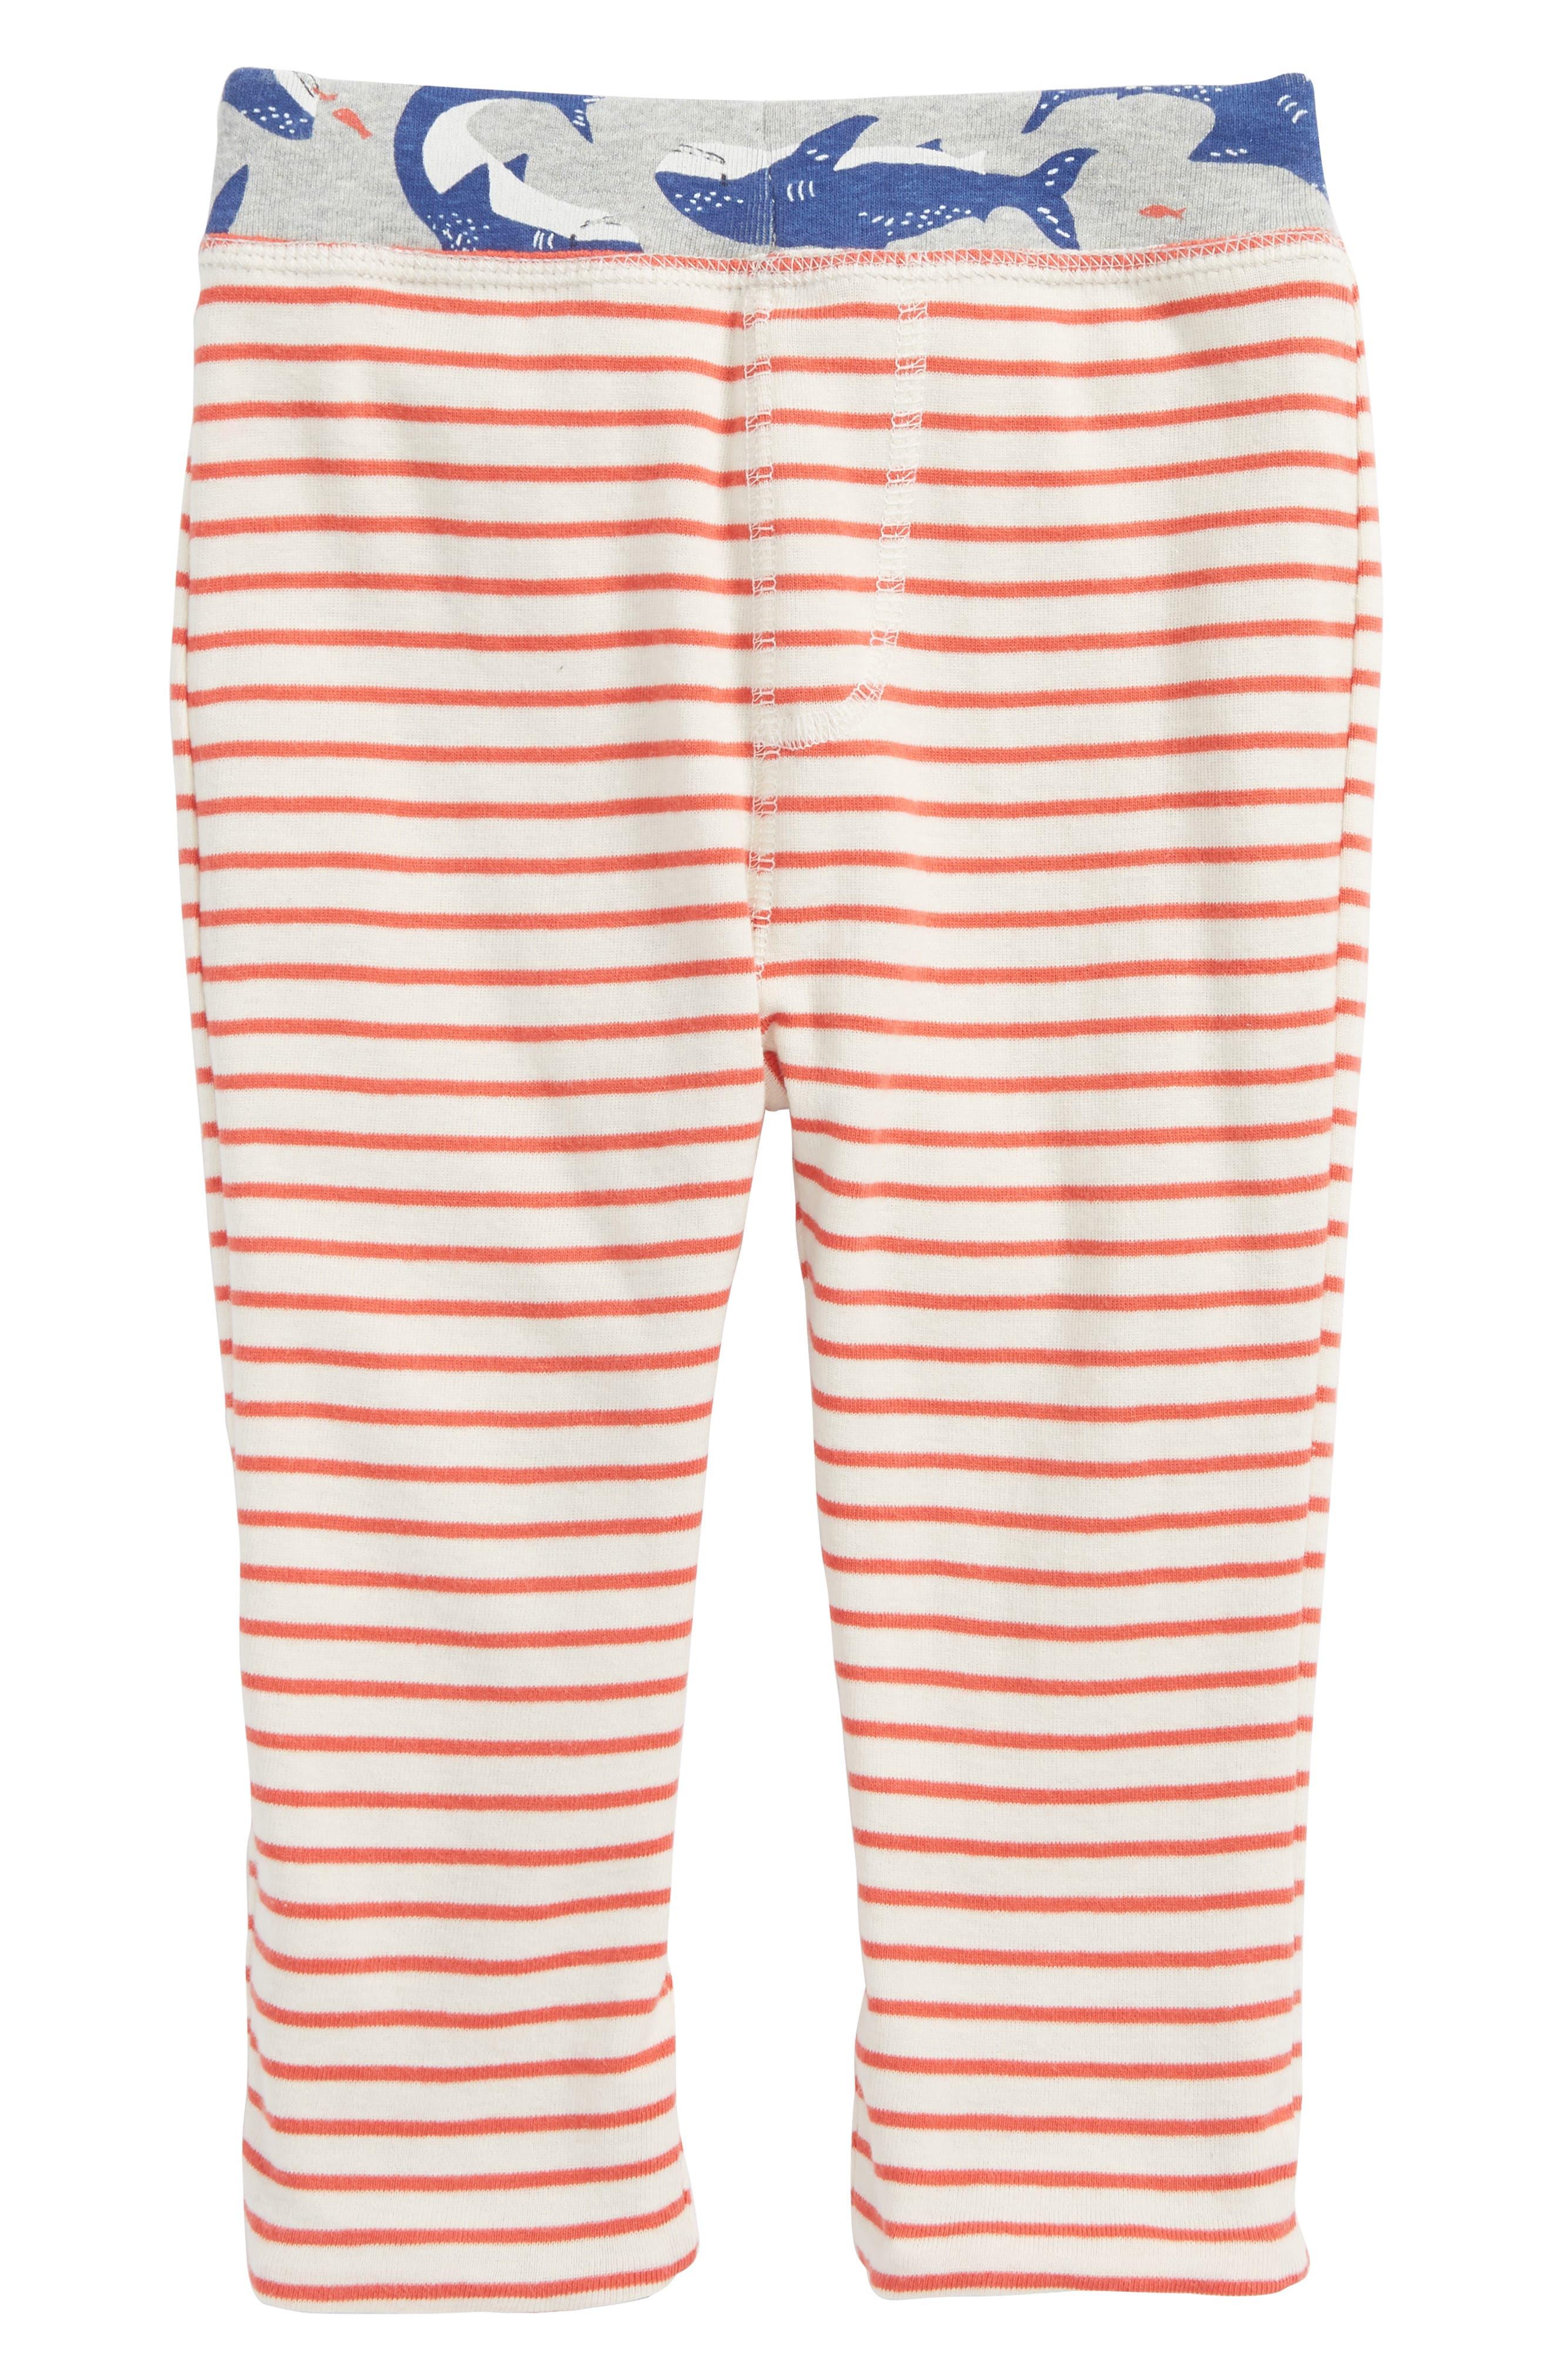 Reversible Knee Patch Pants,                             Alternate thumbnail 2, color,                             062